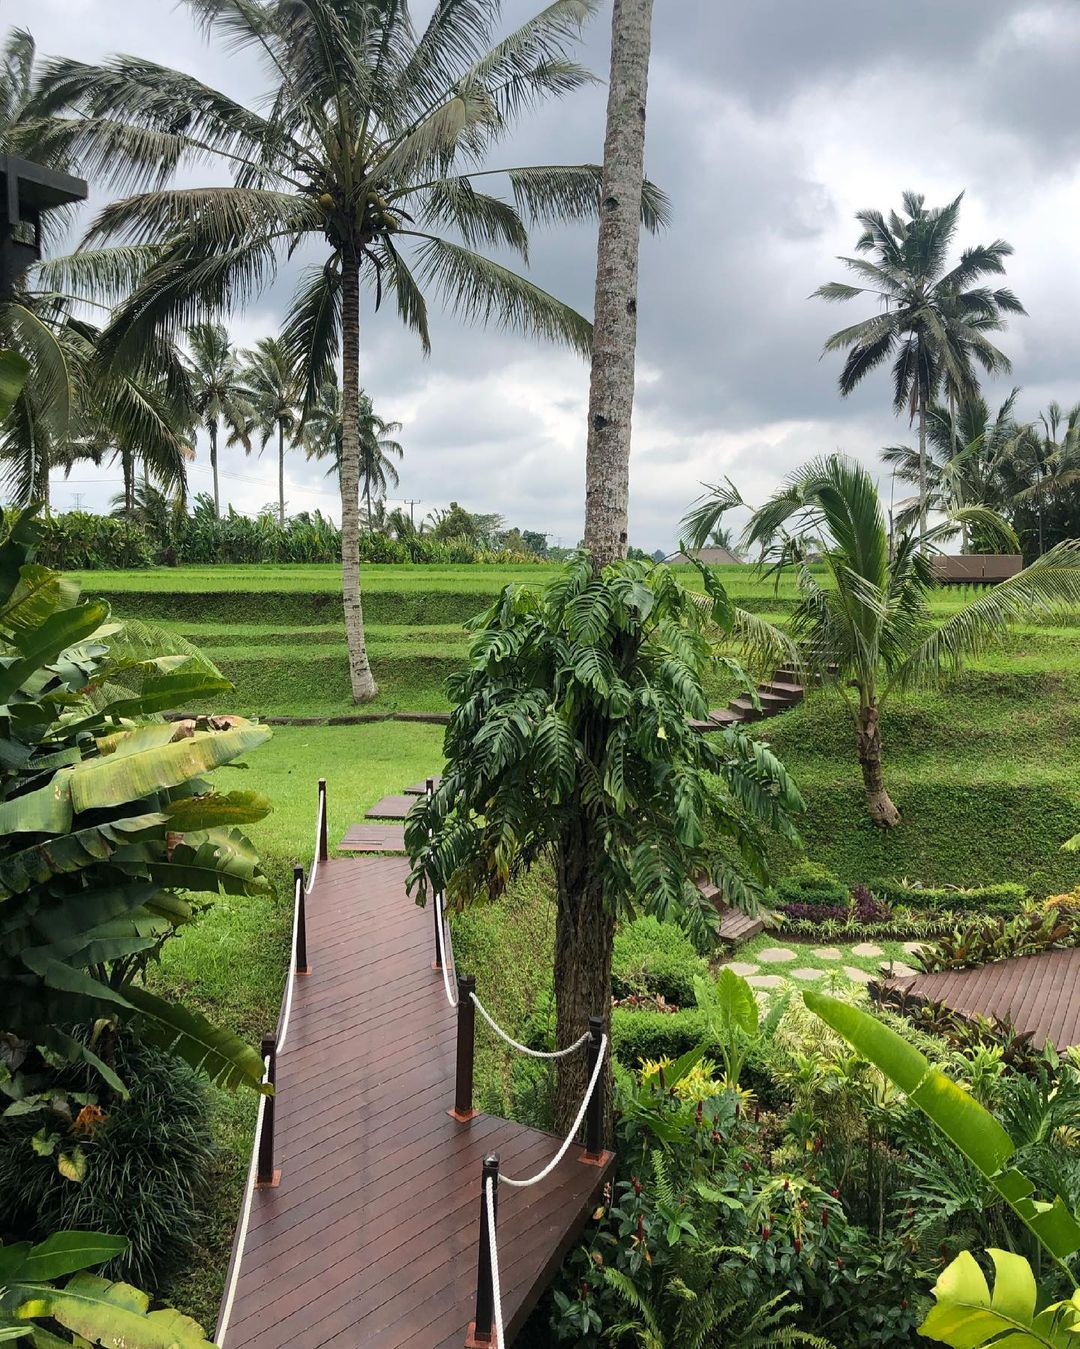 Jalan Setapak Di Secret Garden Village Image From @wander Tan_